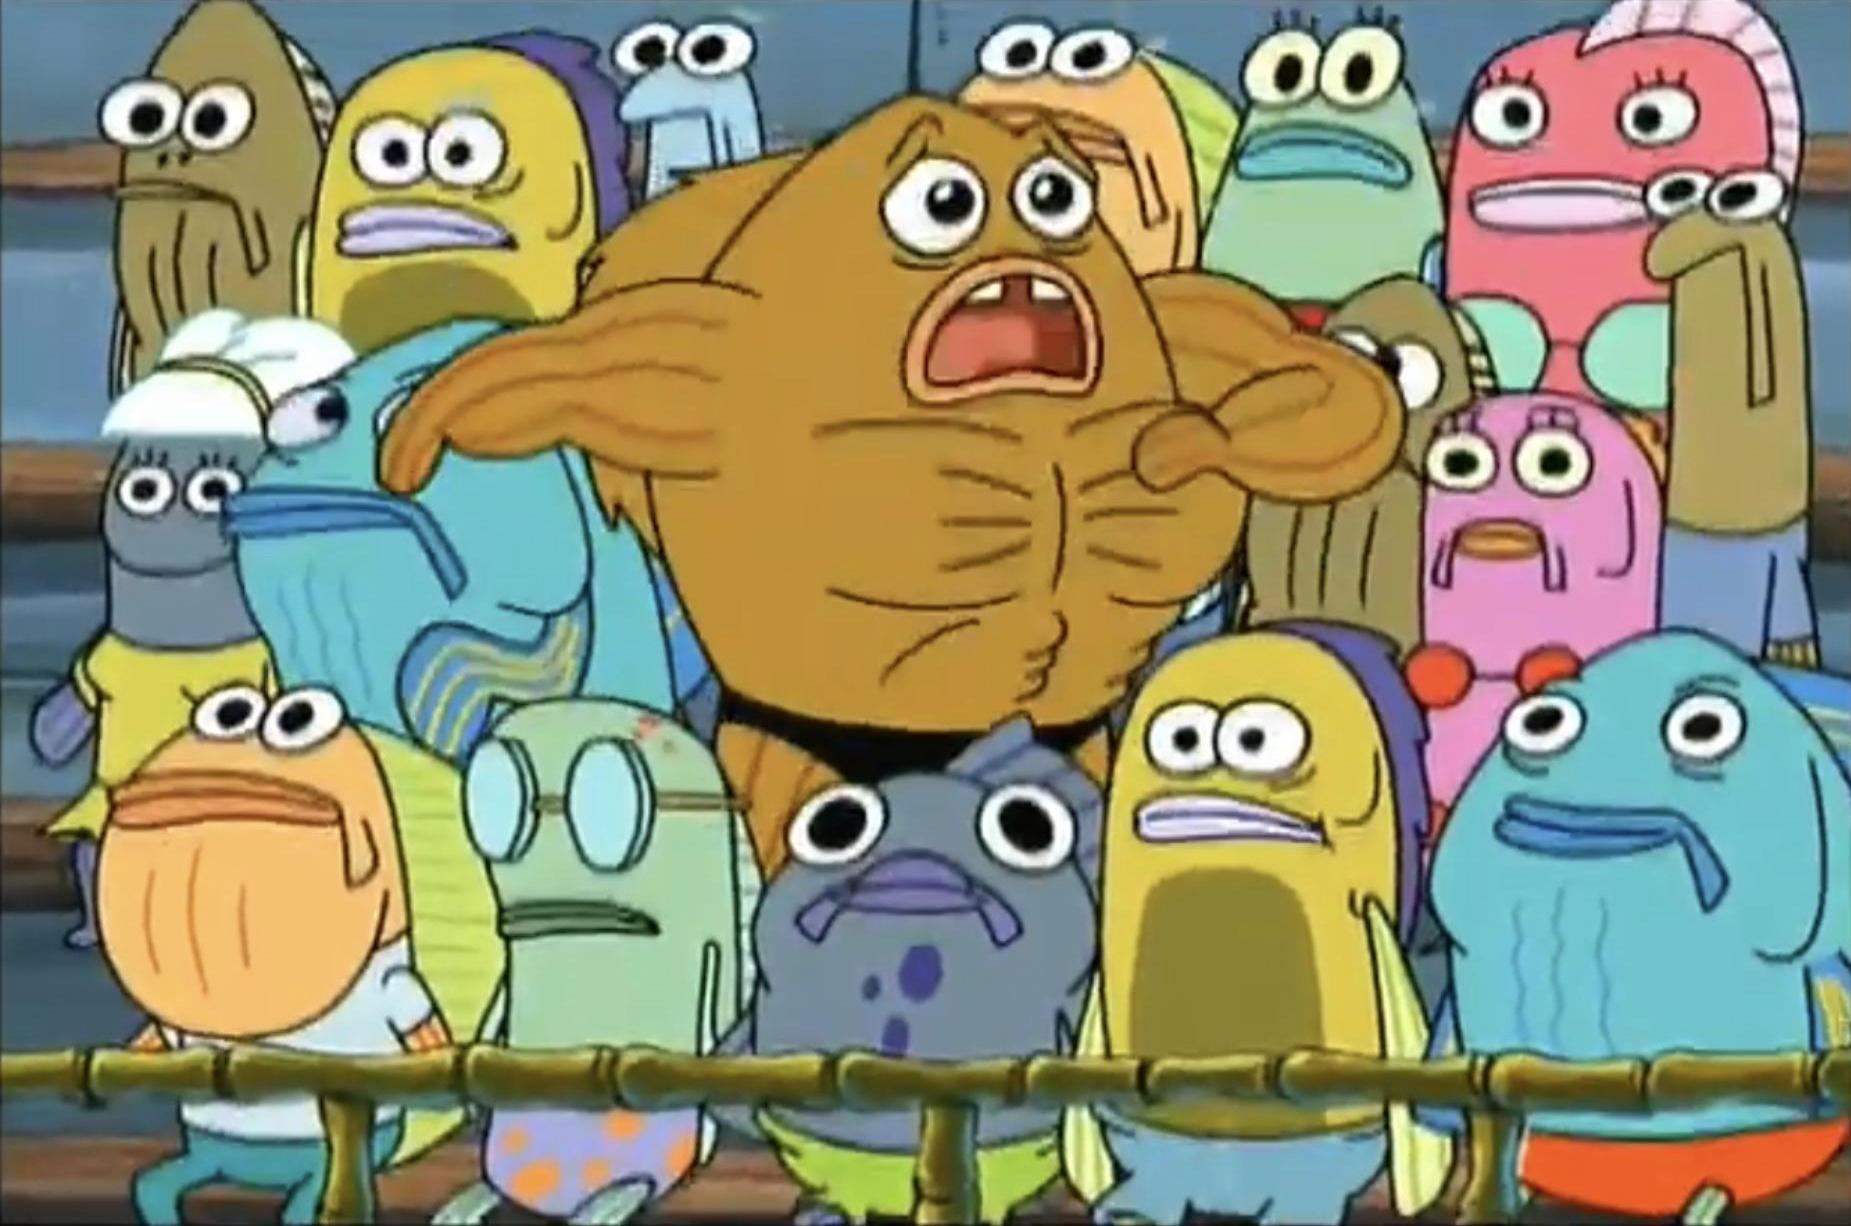 spongebob i gotta get outta here